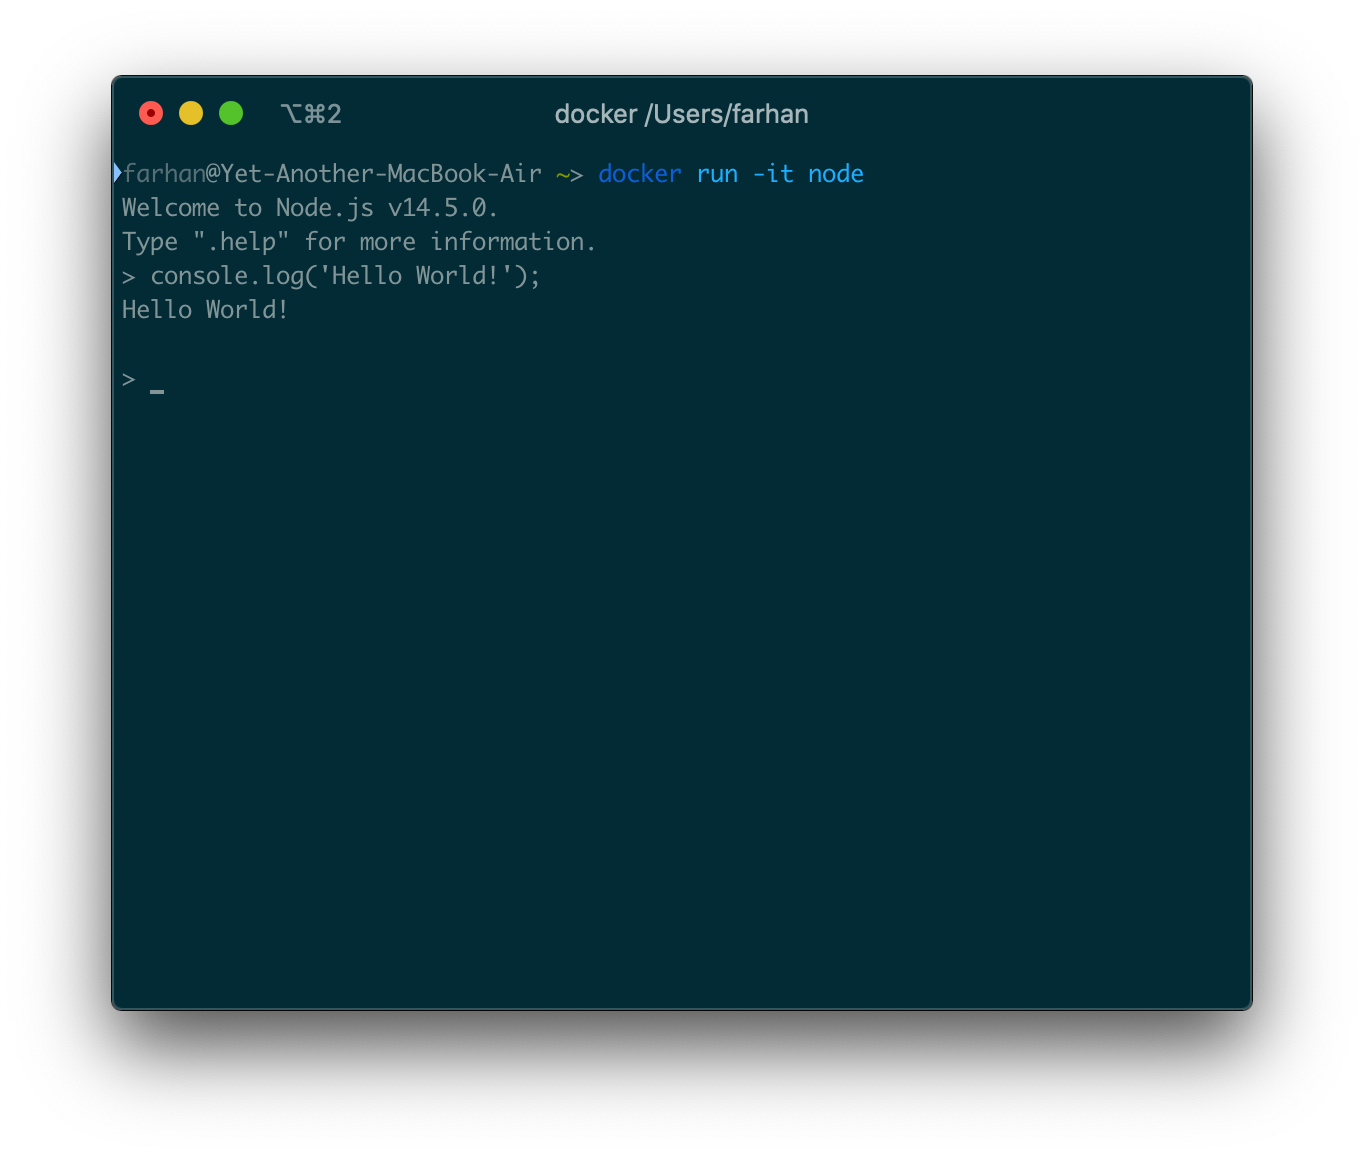 docker run -it node コマンドからの出力